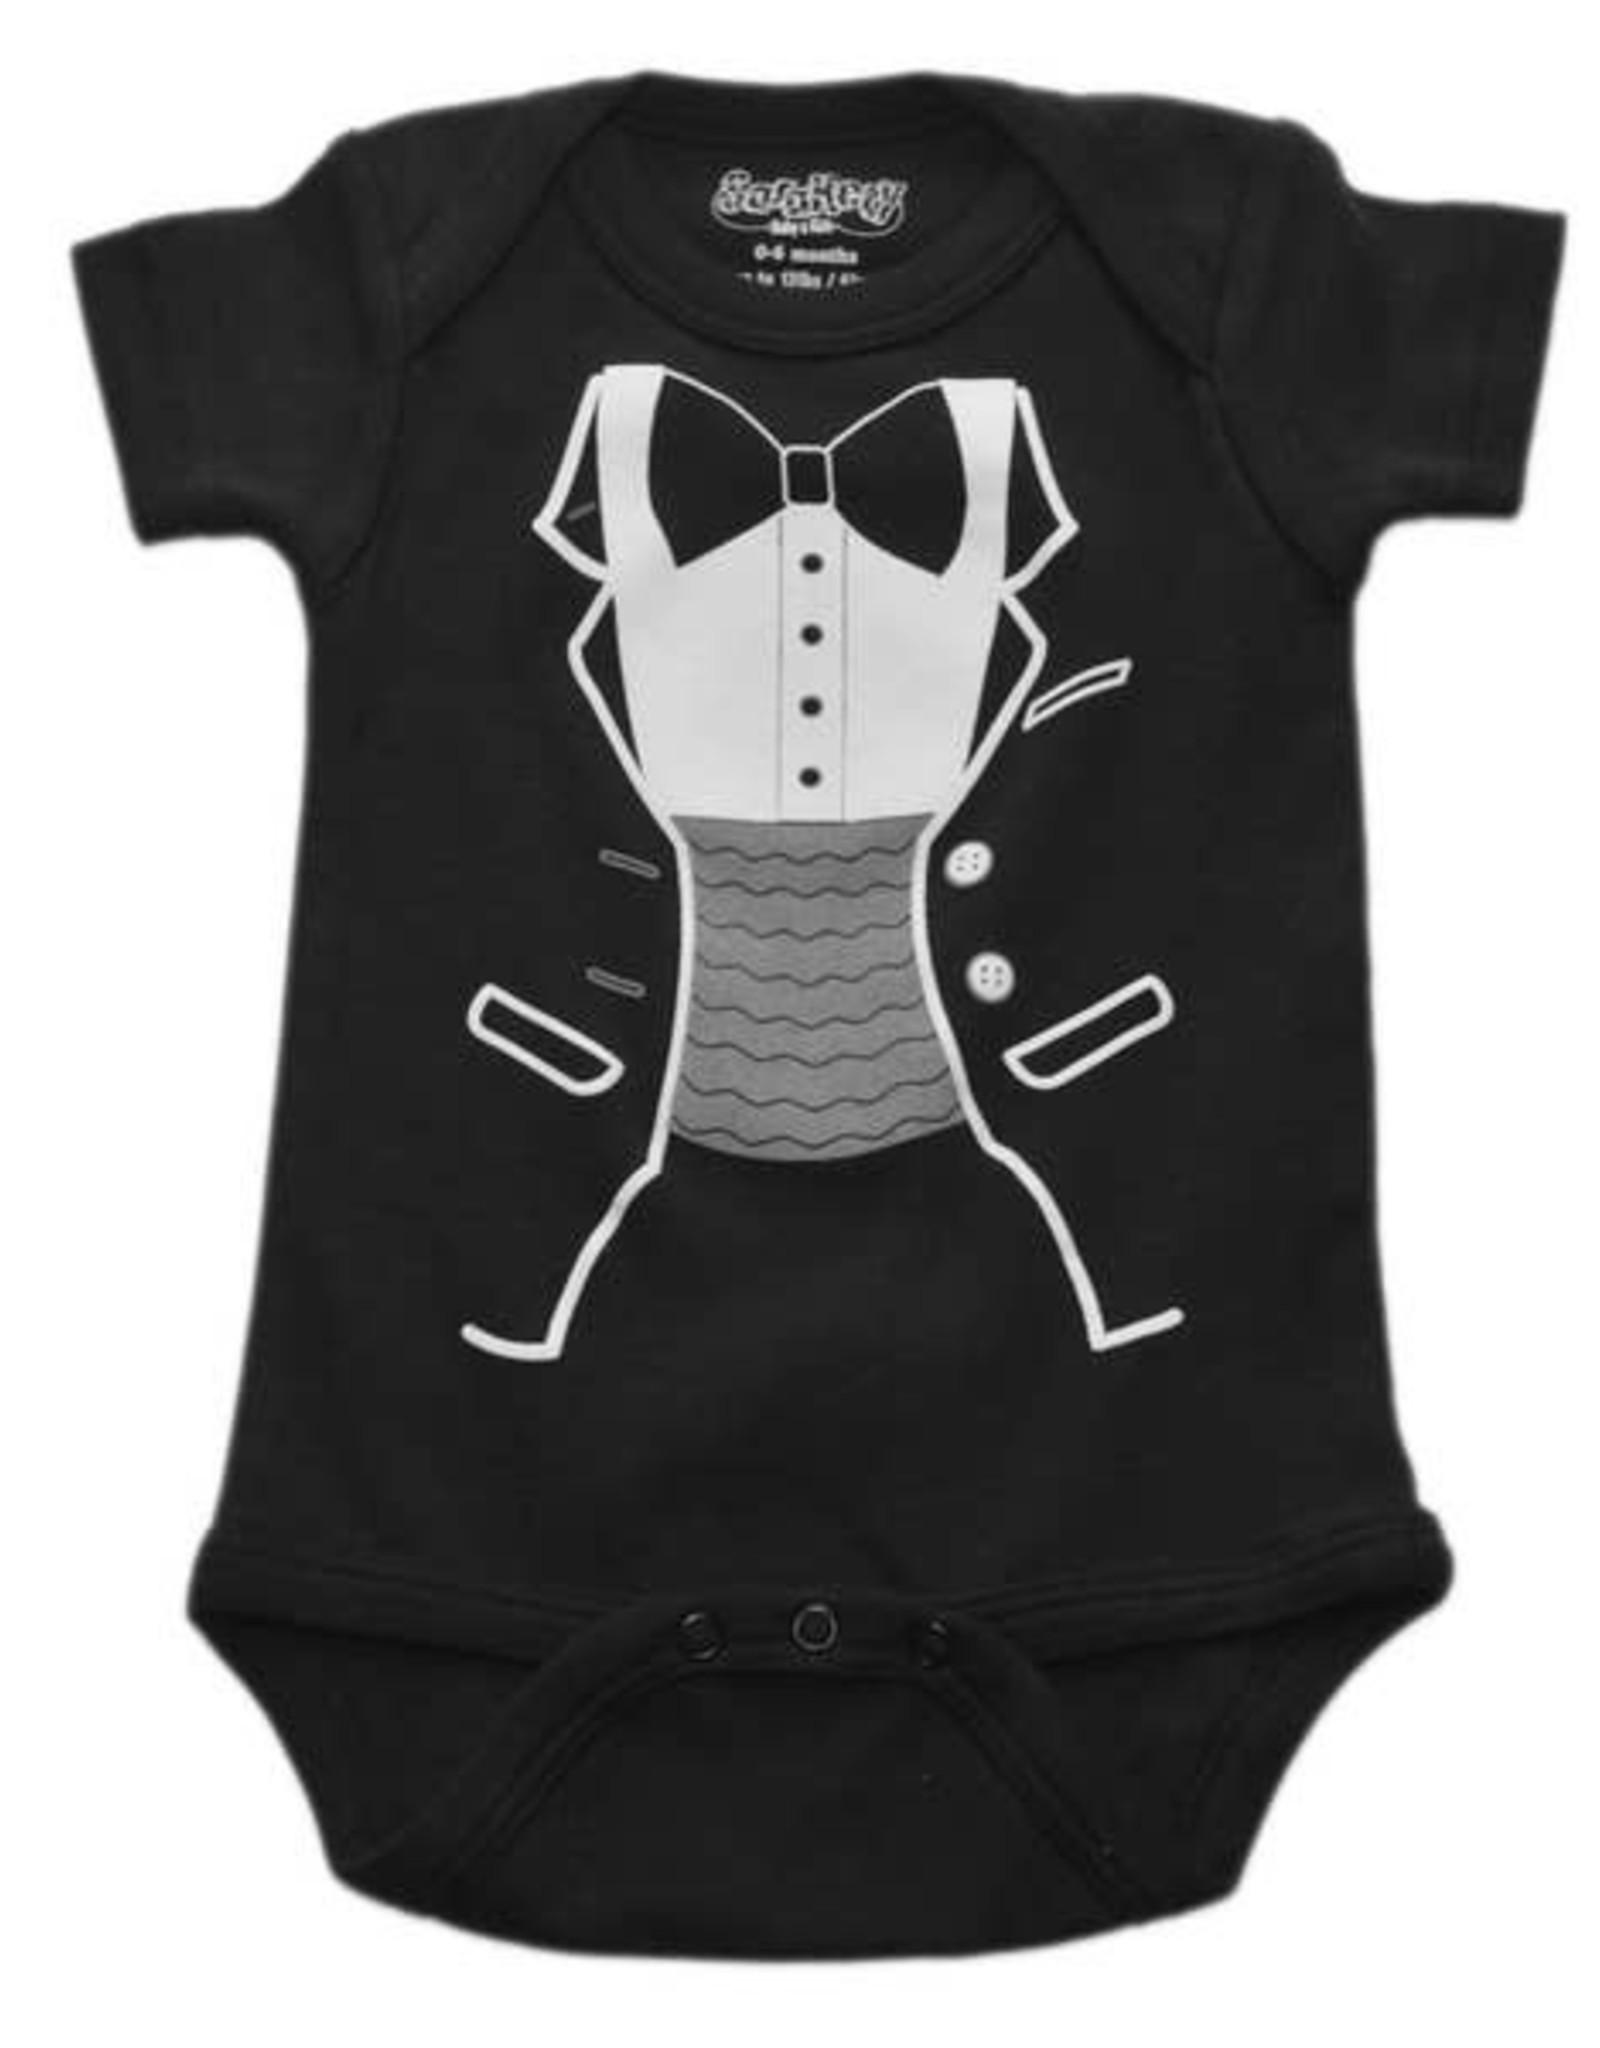 Sara Kety Onesie Tiny Tux 6-12 Months Black